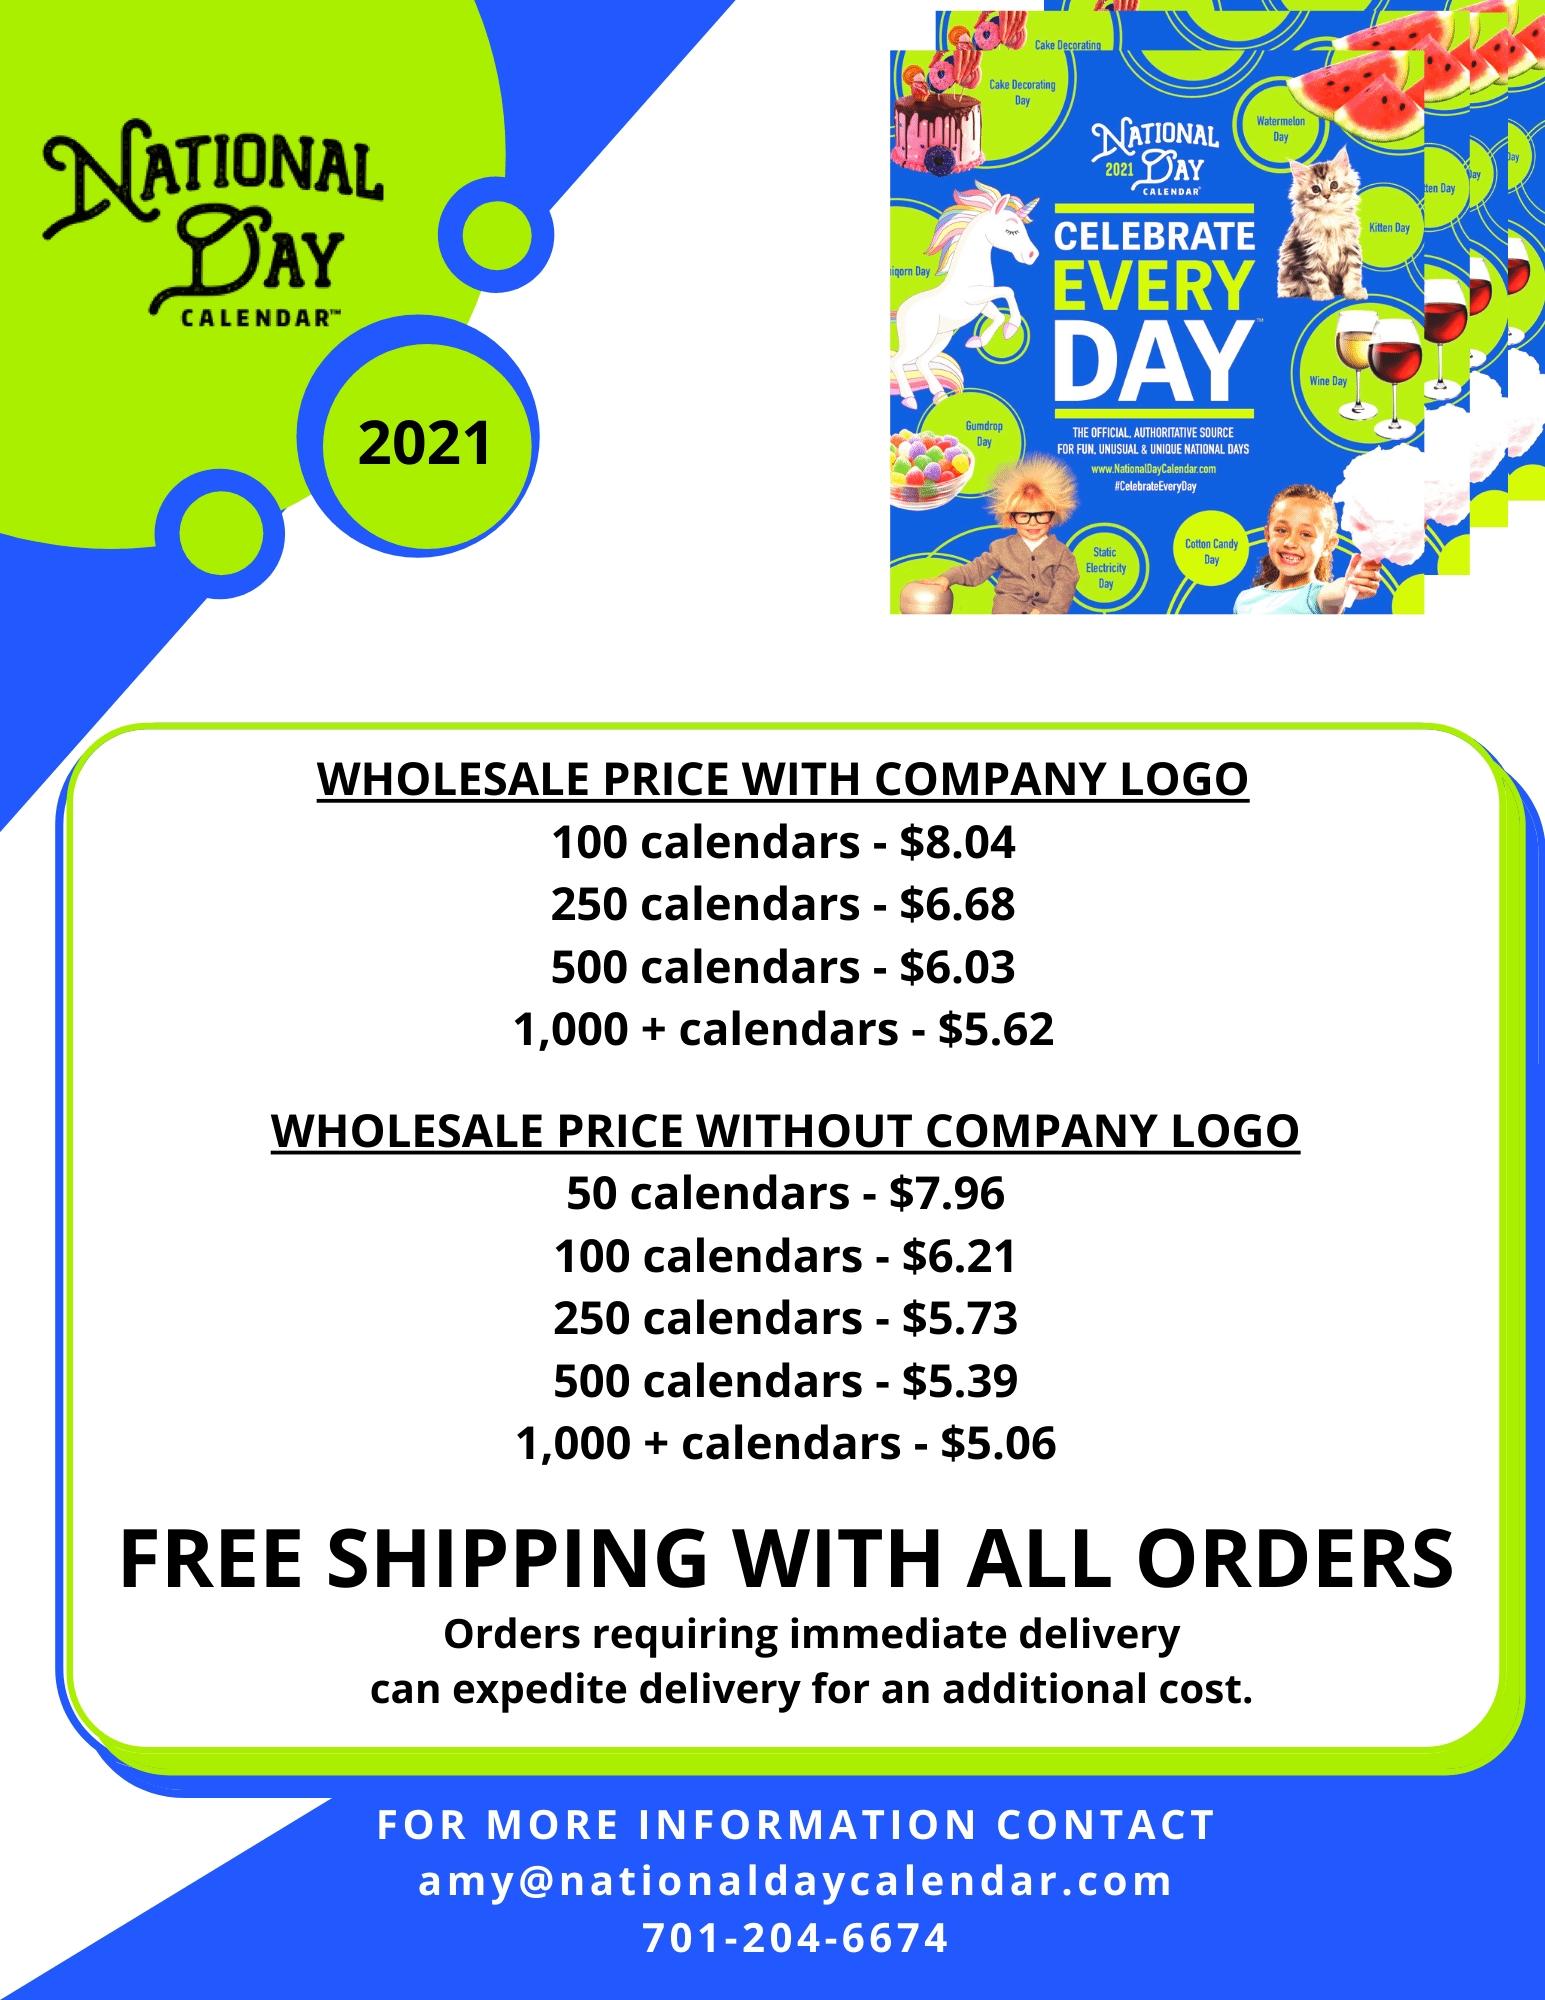 Take National Day Calendar 2021 Free